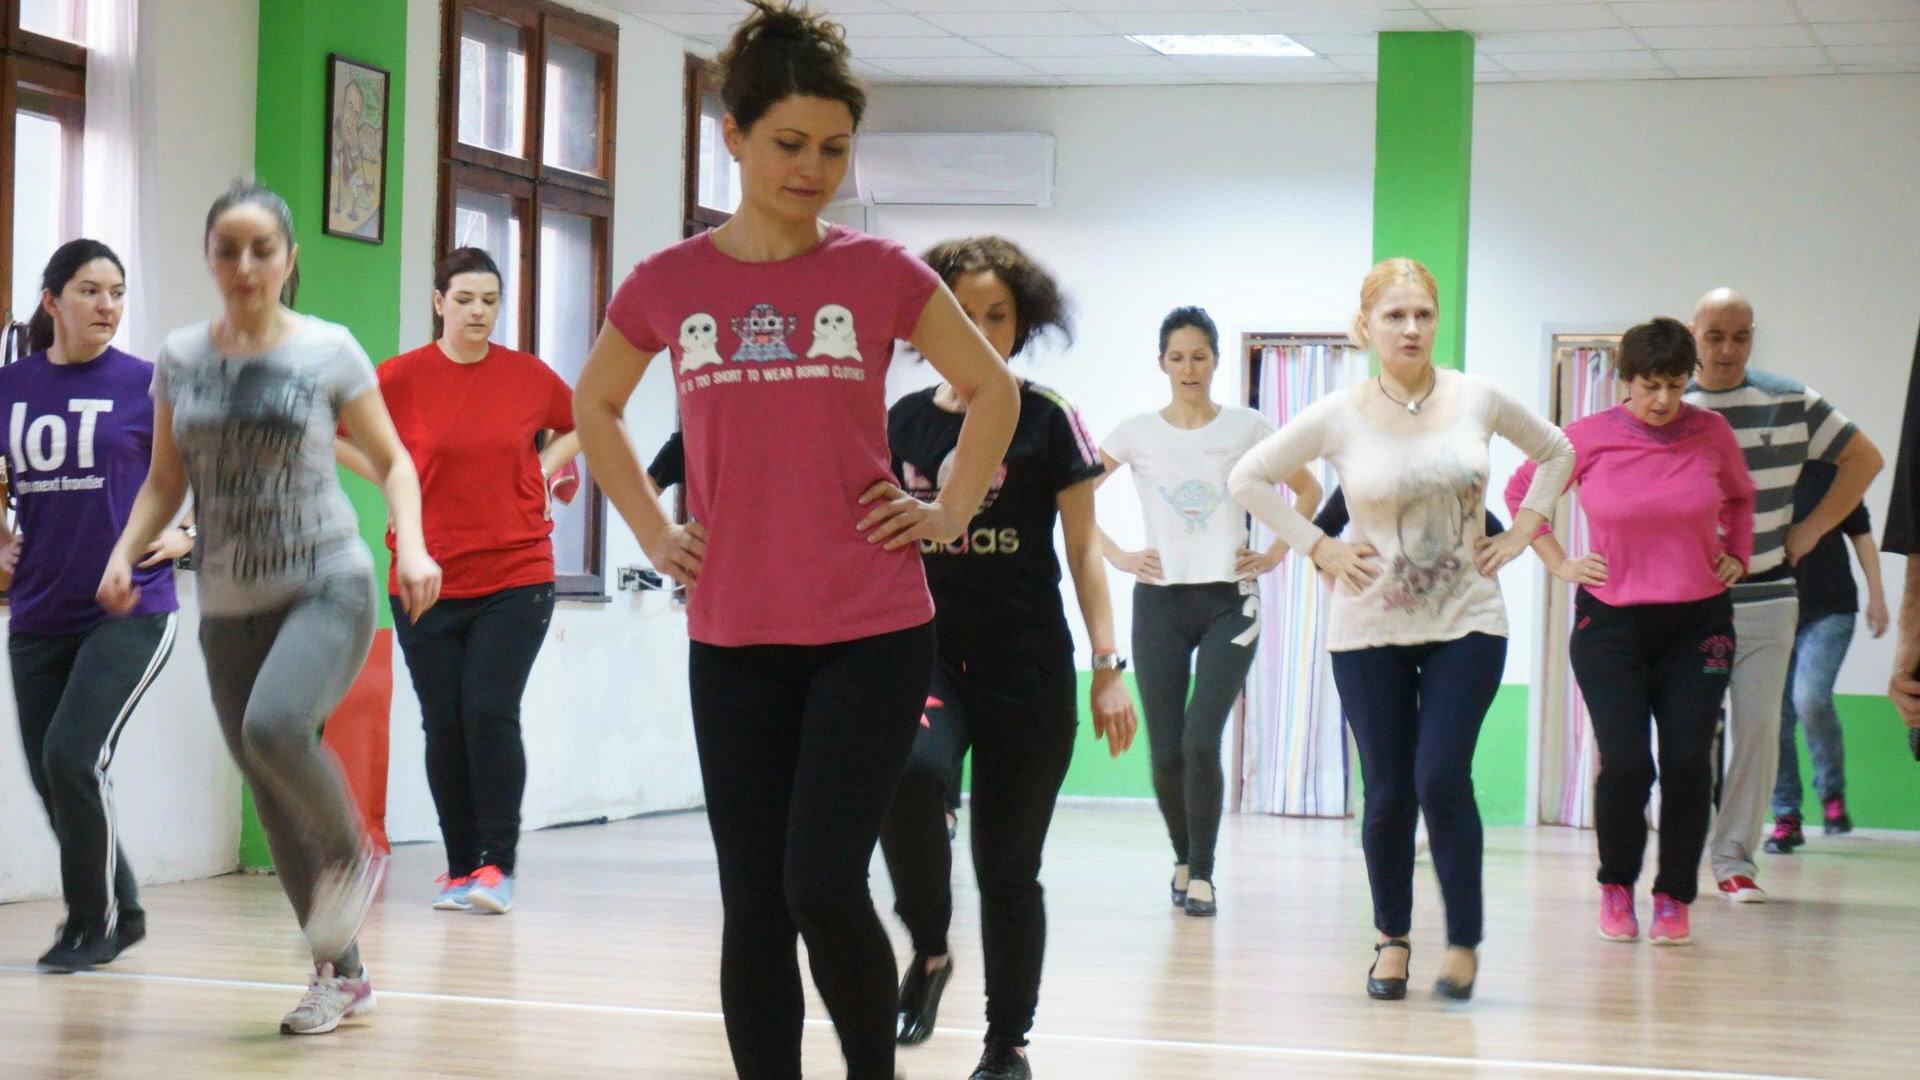 Photo of training group in ПЛОВДИВ. Снимка на група тренираща народни танци